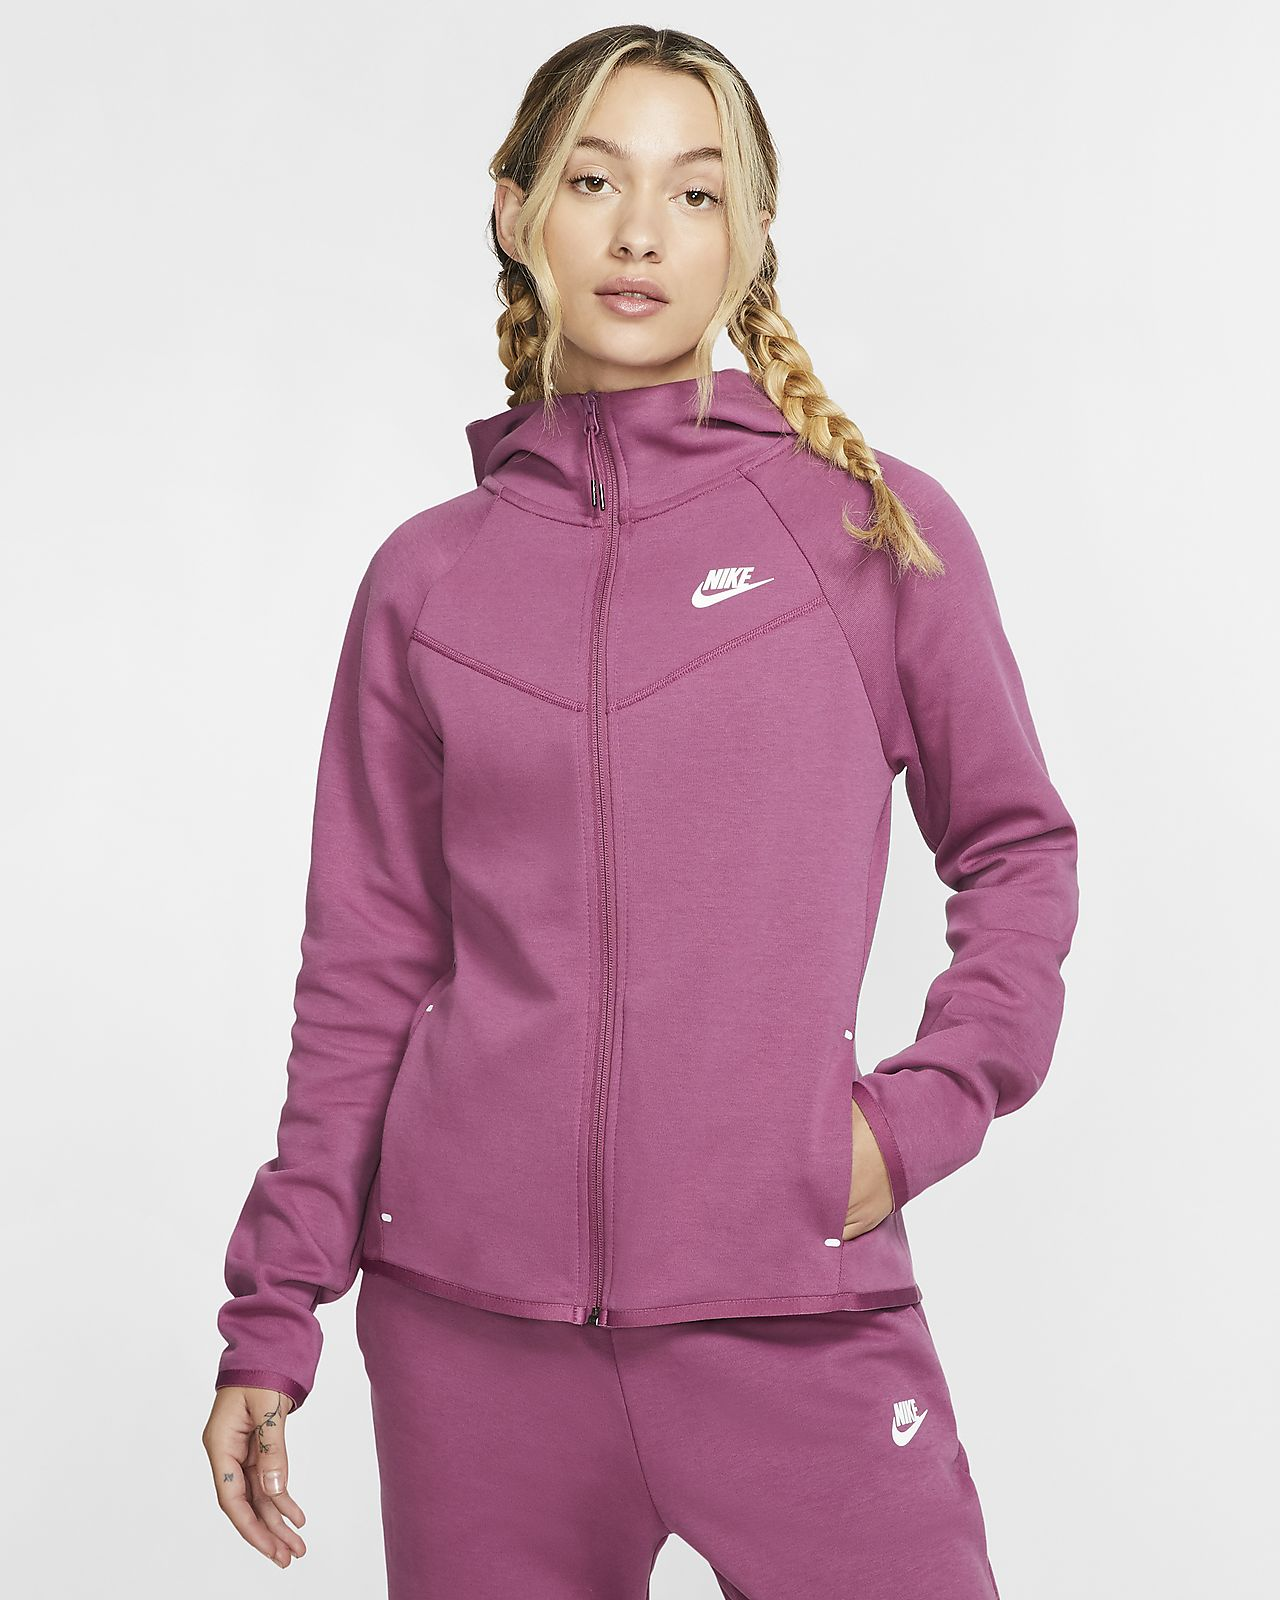 Женская худи c молнией во всю длину Nike Sportswear Windrunner Tech Fleece